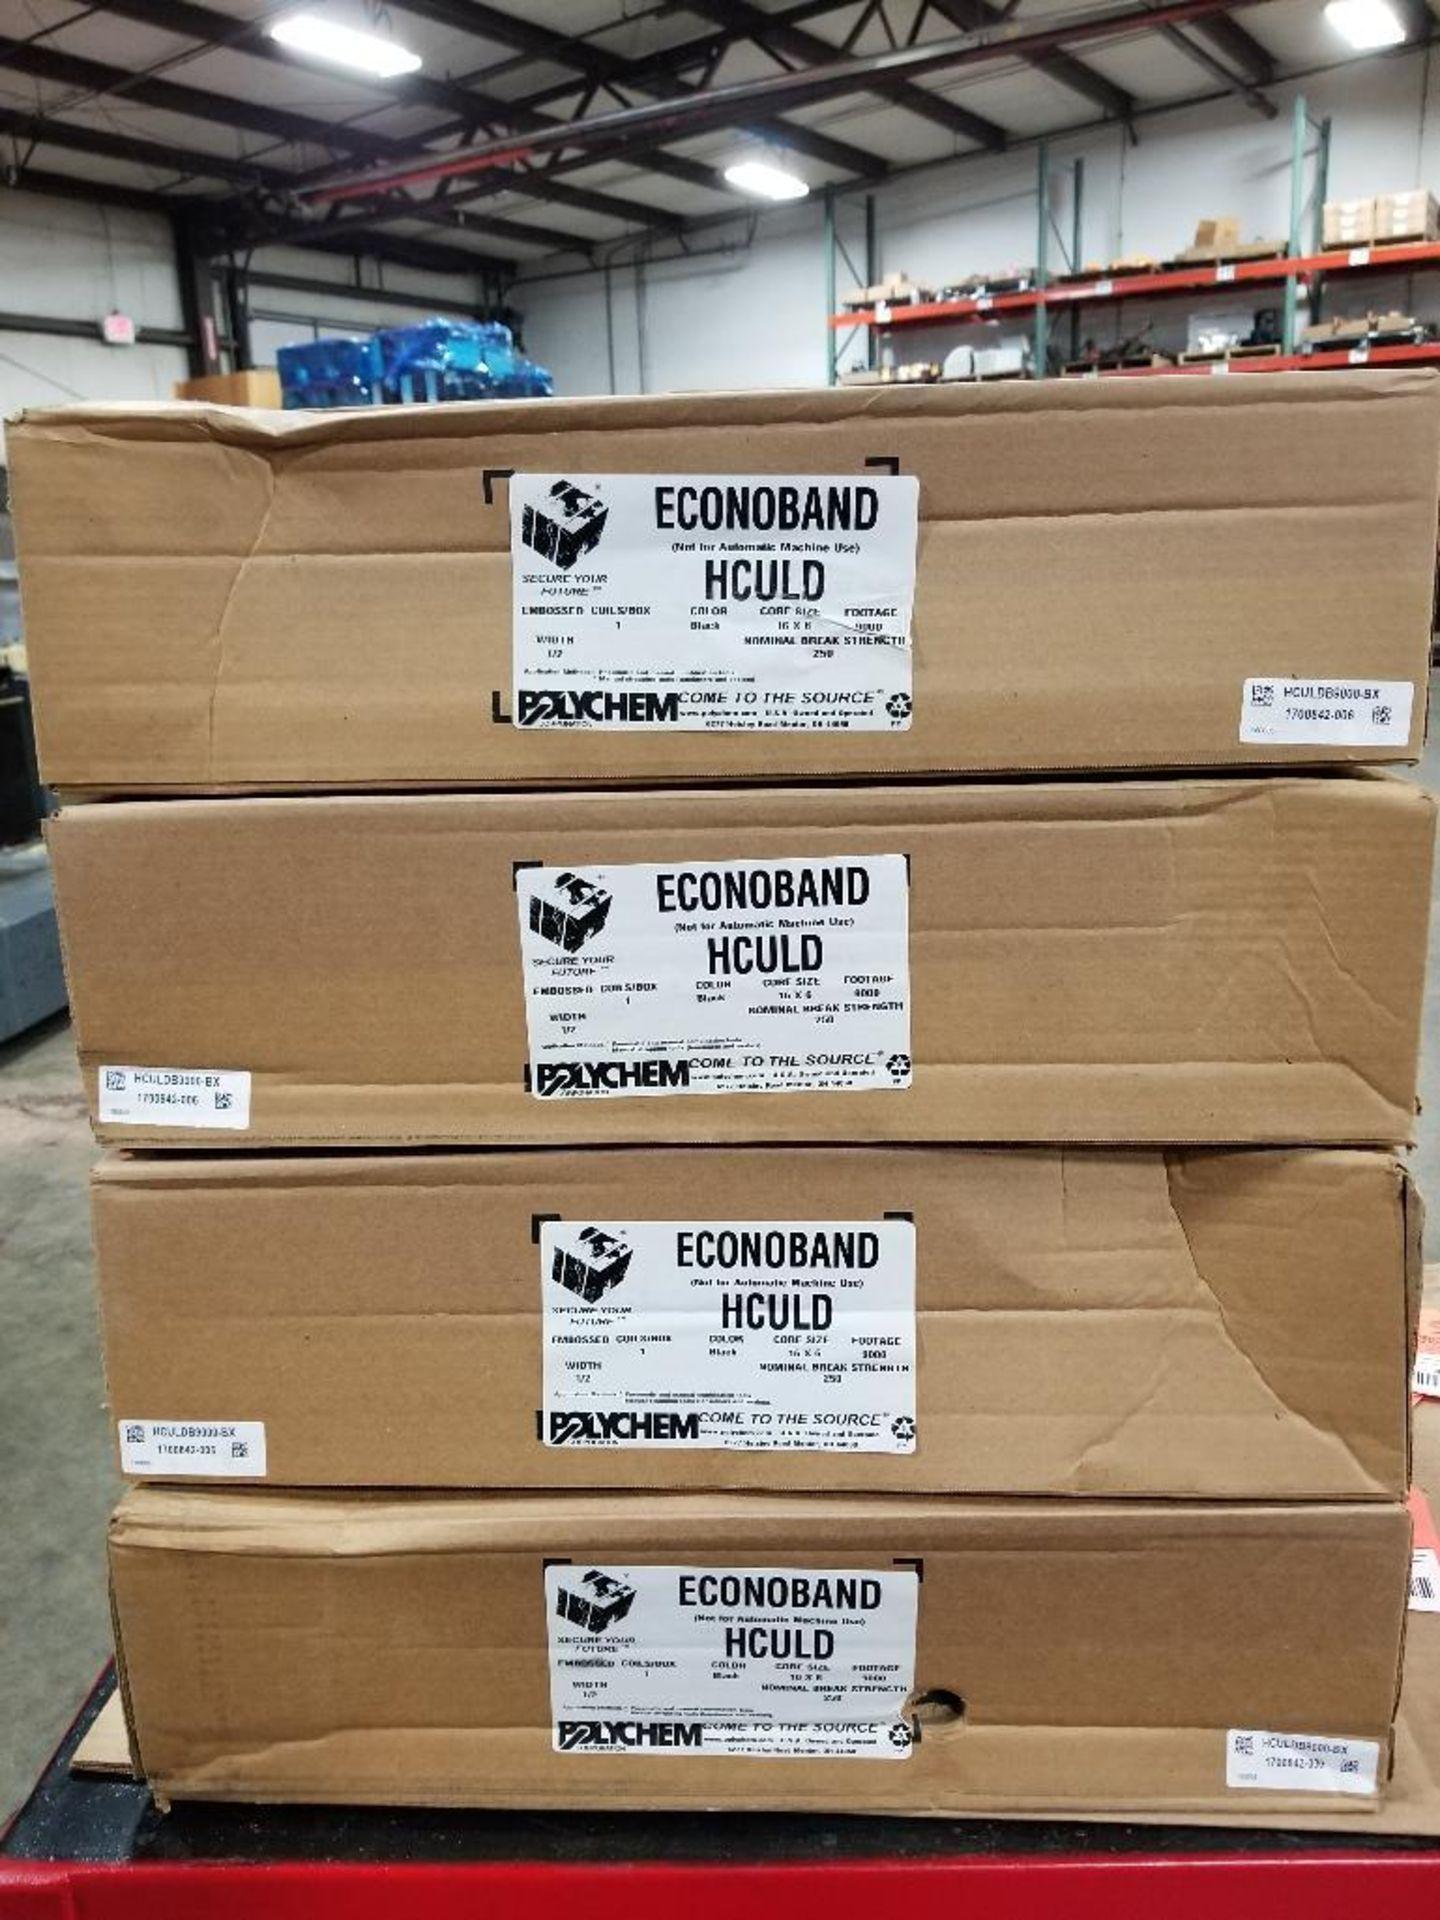 "Qty 4 - Polychem Econoband HCULD 9000Ft black banding. 1/2""."